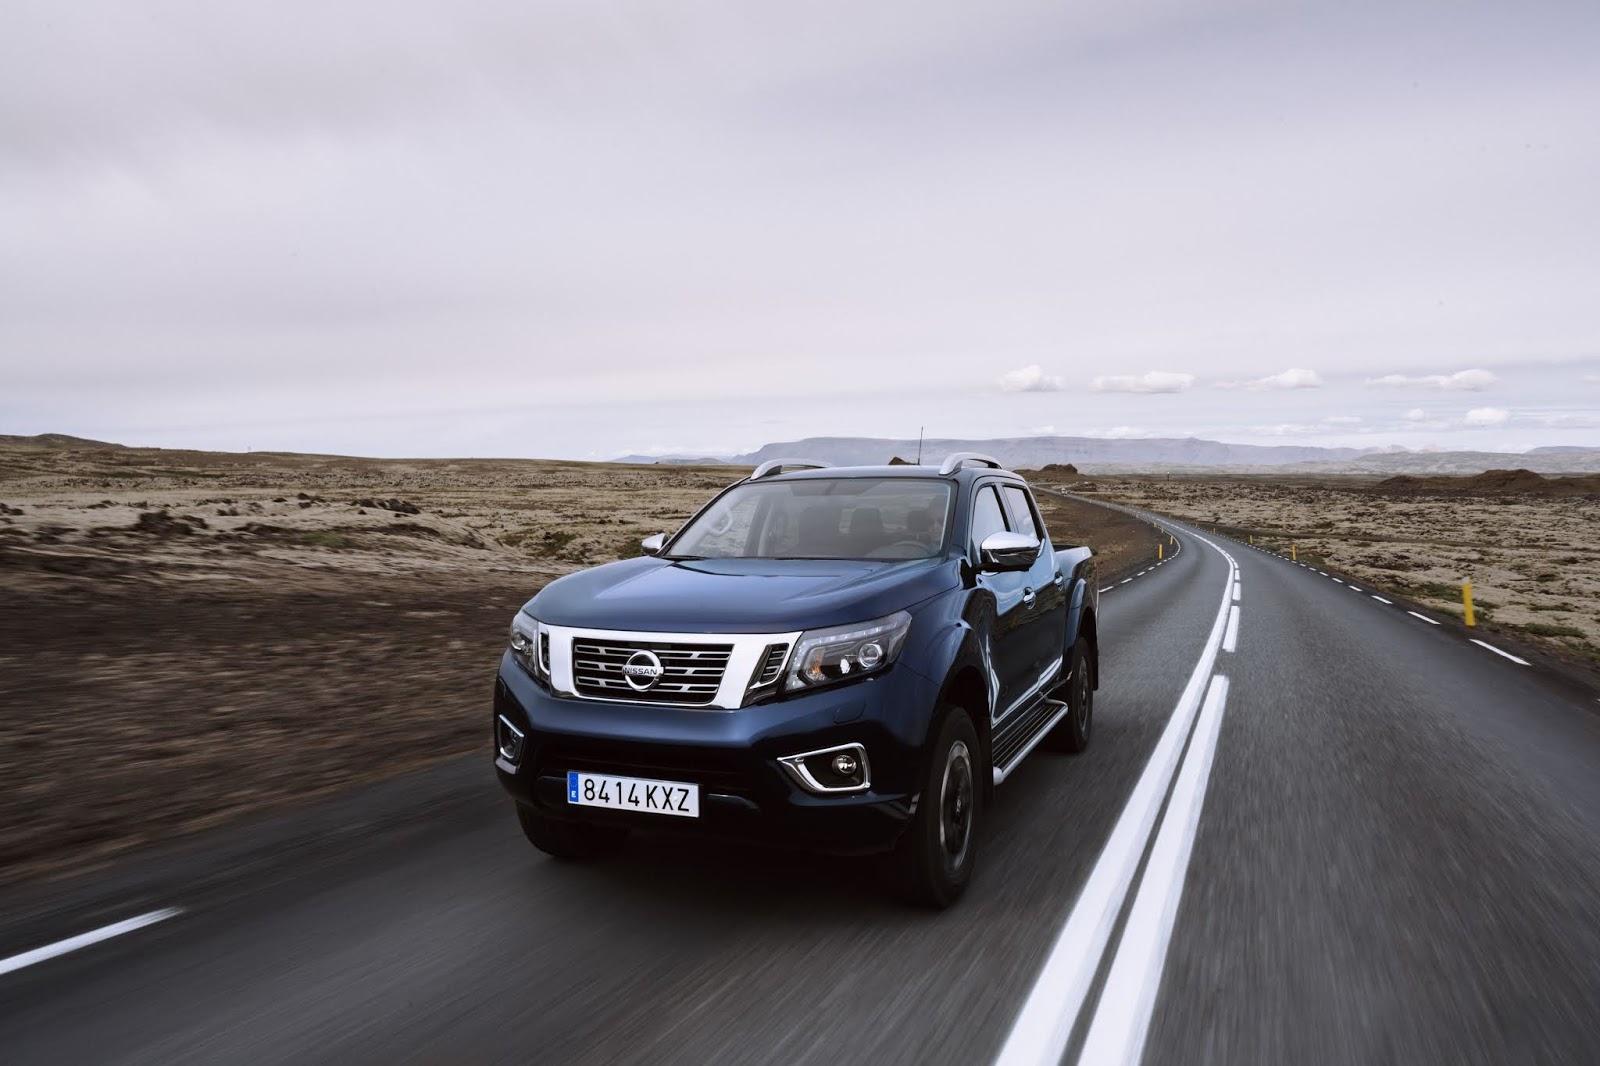 Nissan2BNavara2BDouble2BCab 2BBlue Iceland 2BDynamic Front2B3